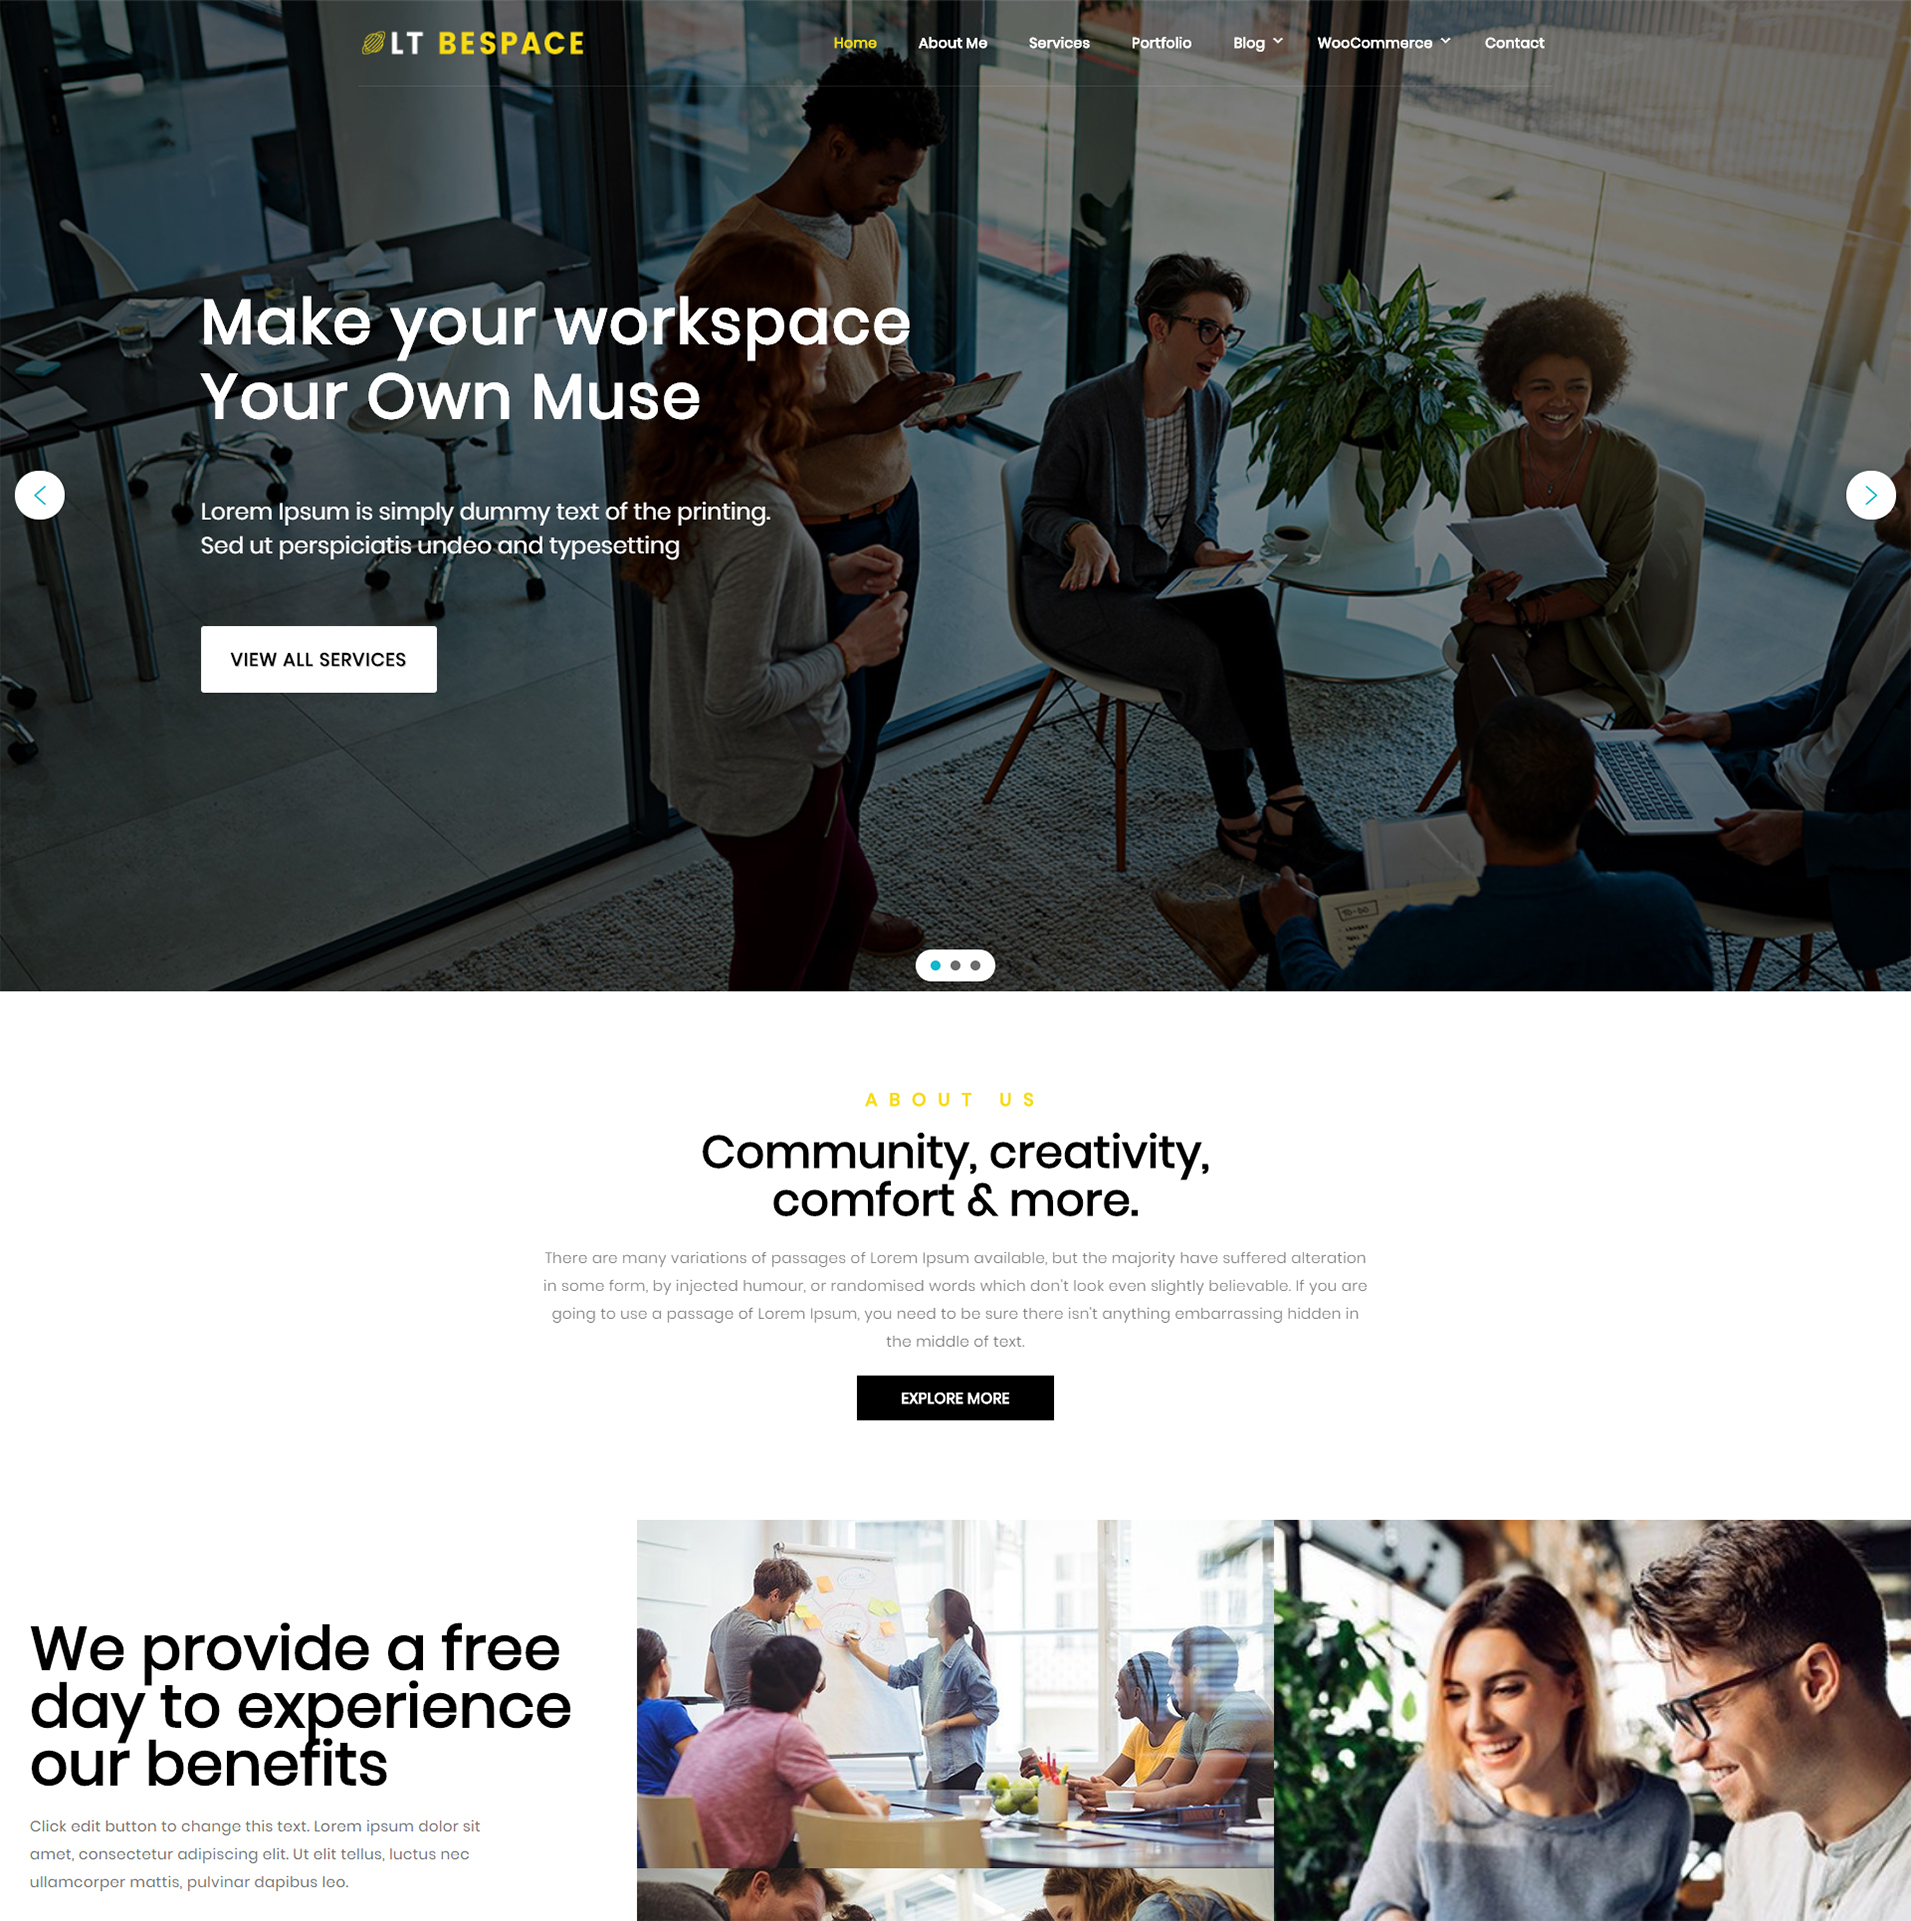 lt-bespace-fullscreen